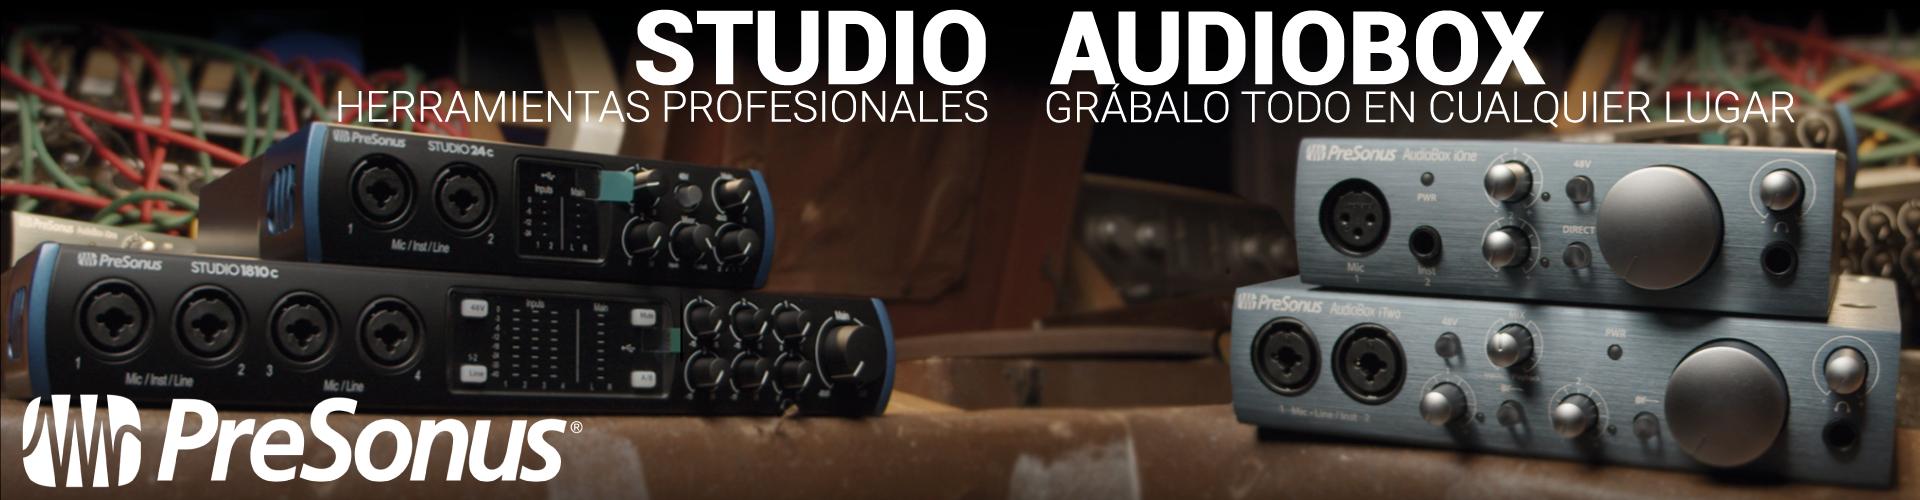 Interfaces de audio Presonus - Studio y Audiobox